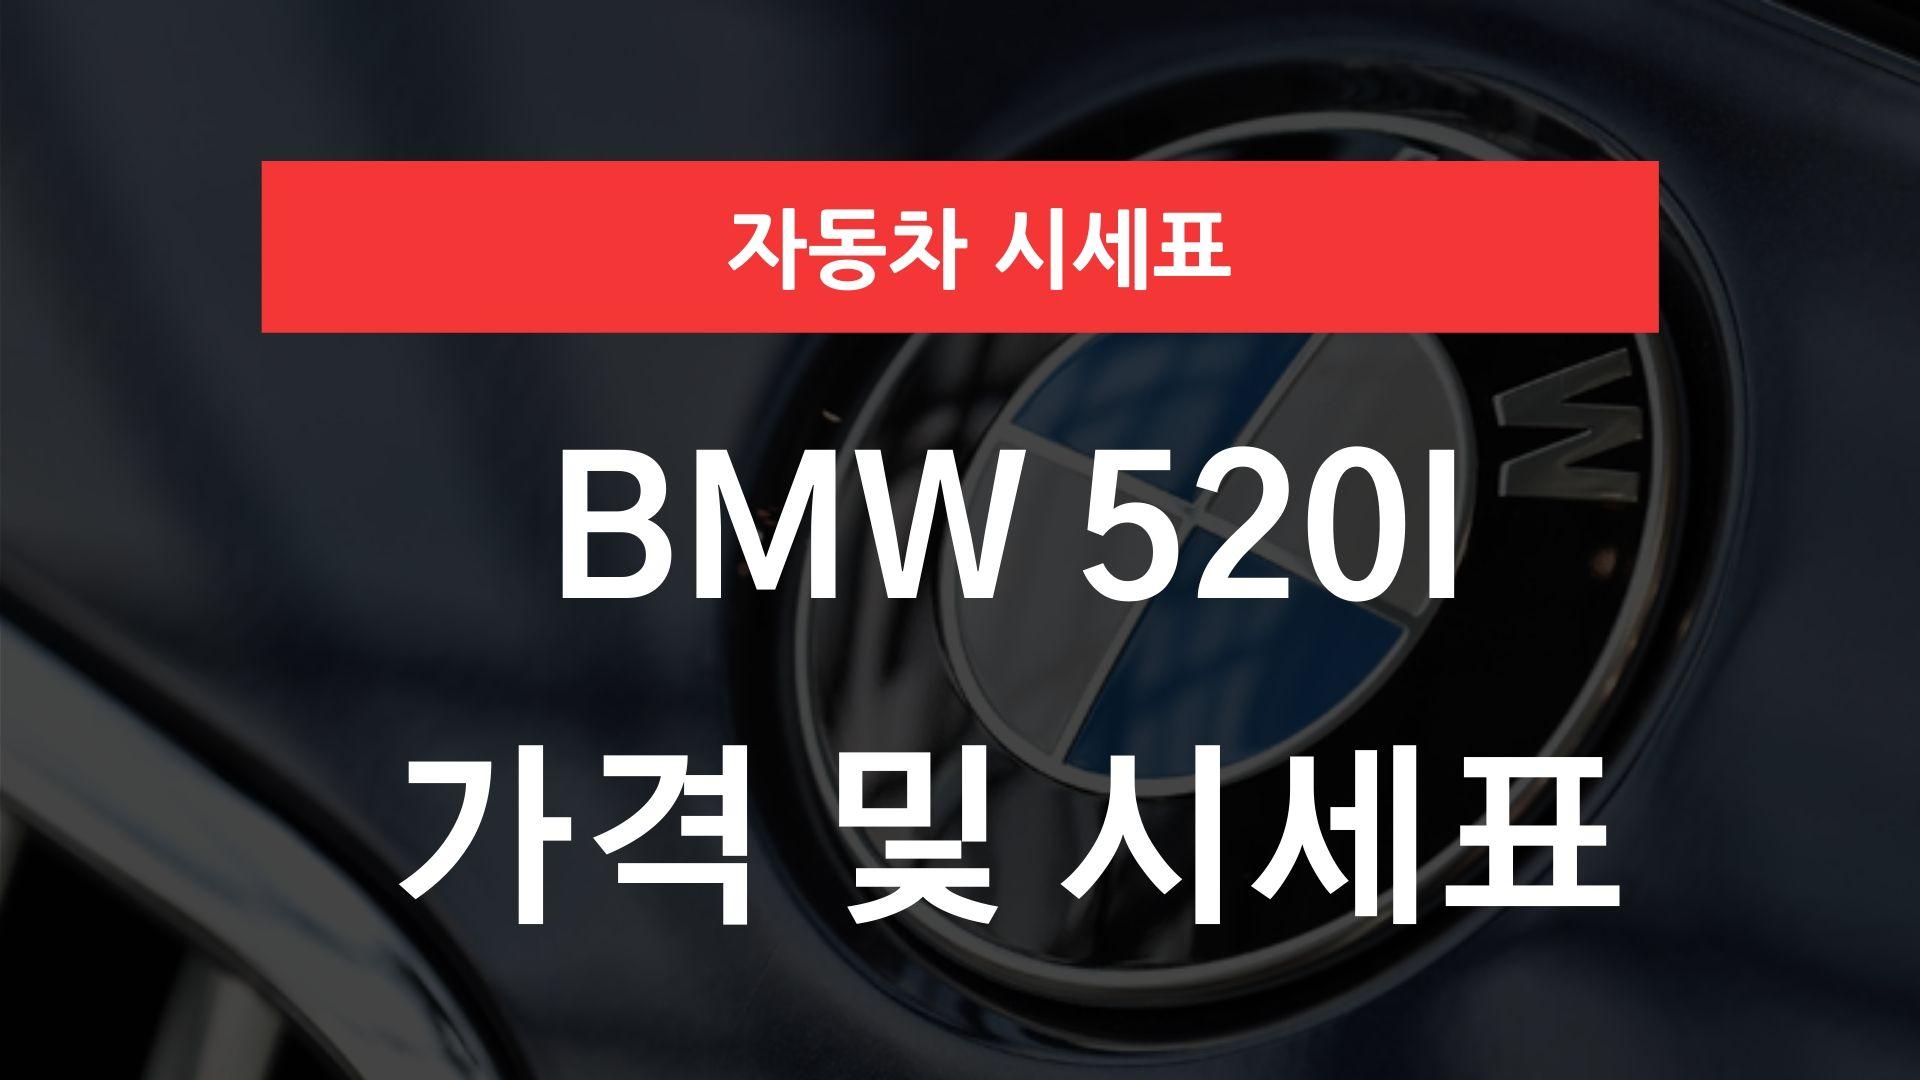 BMW 520i 가격